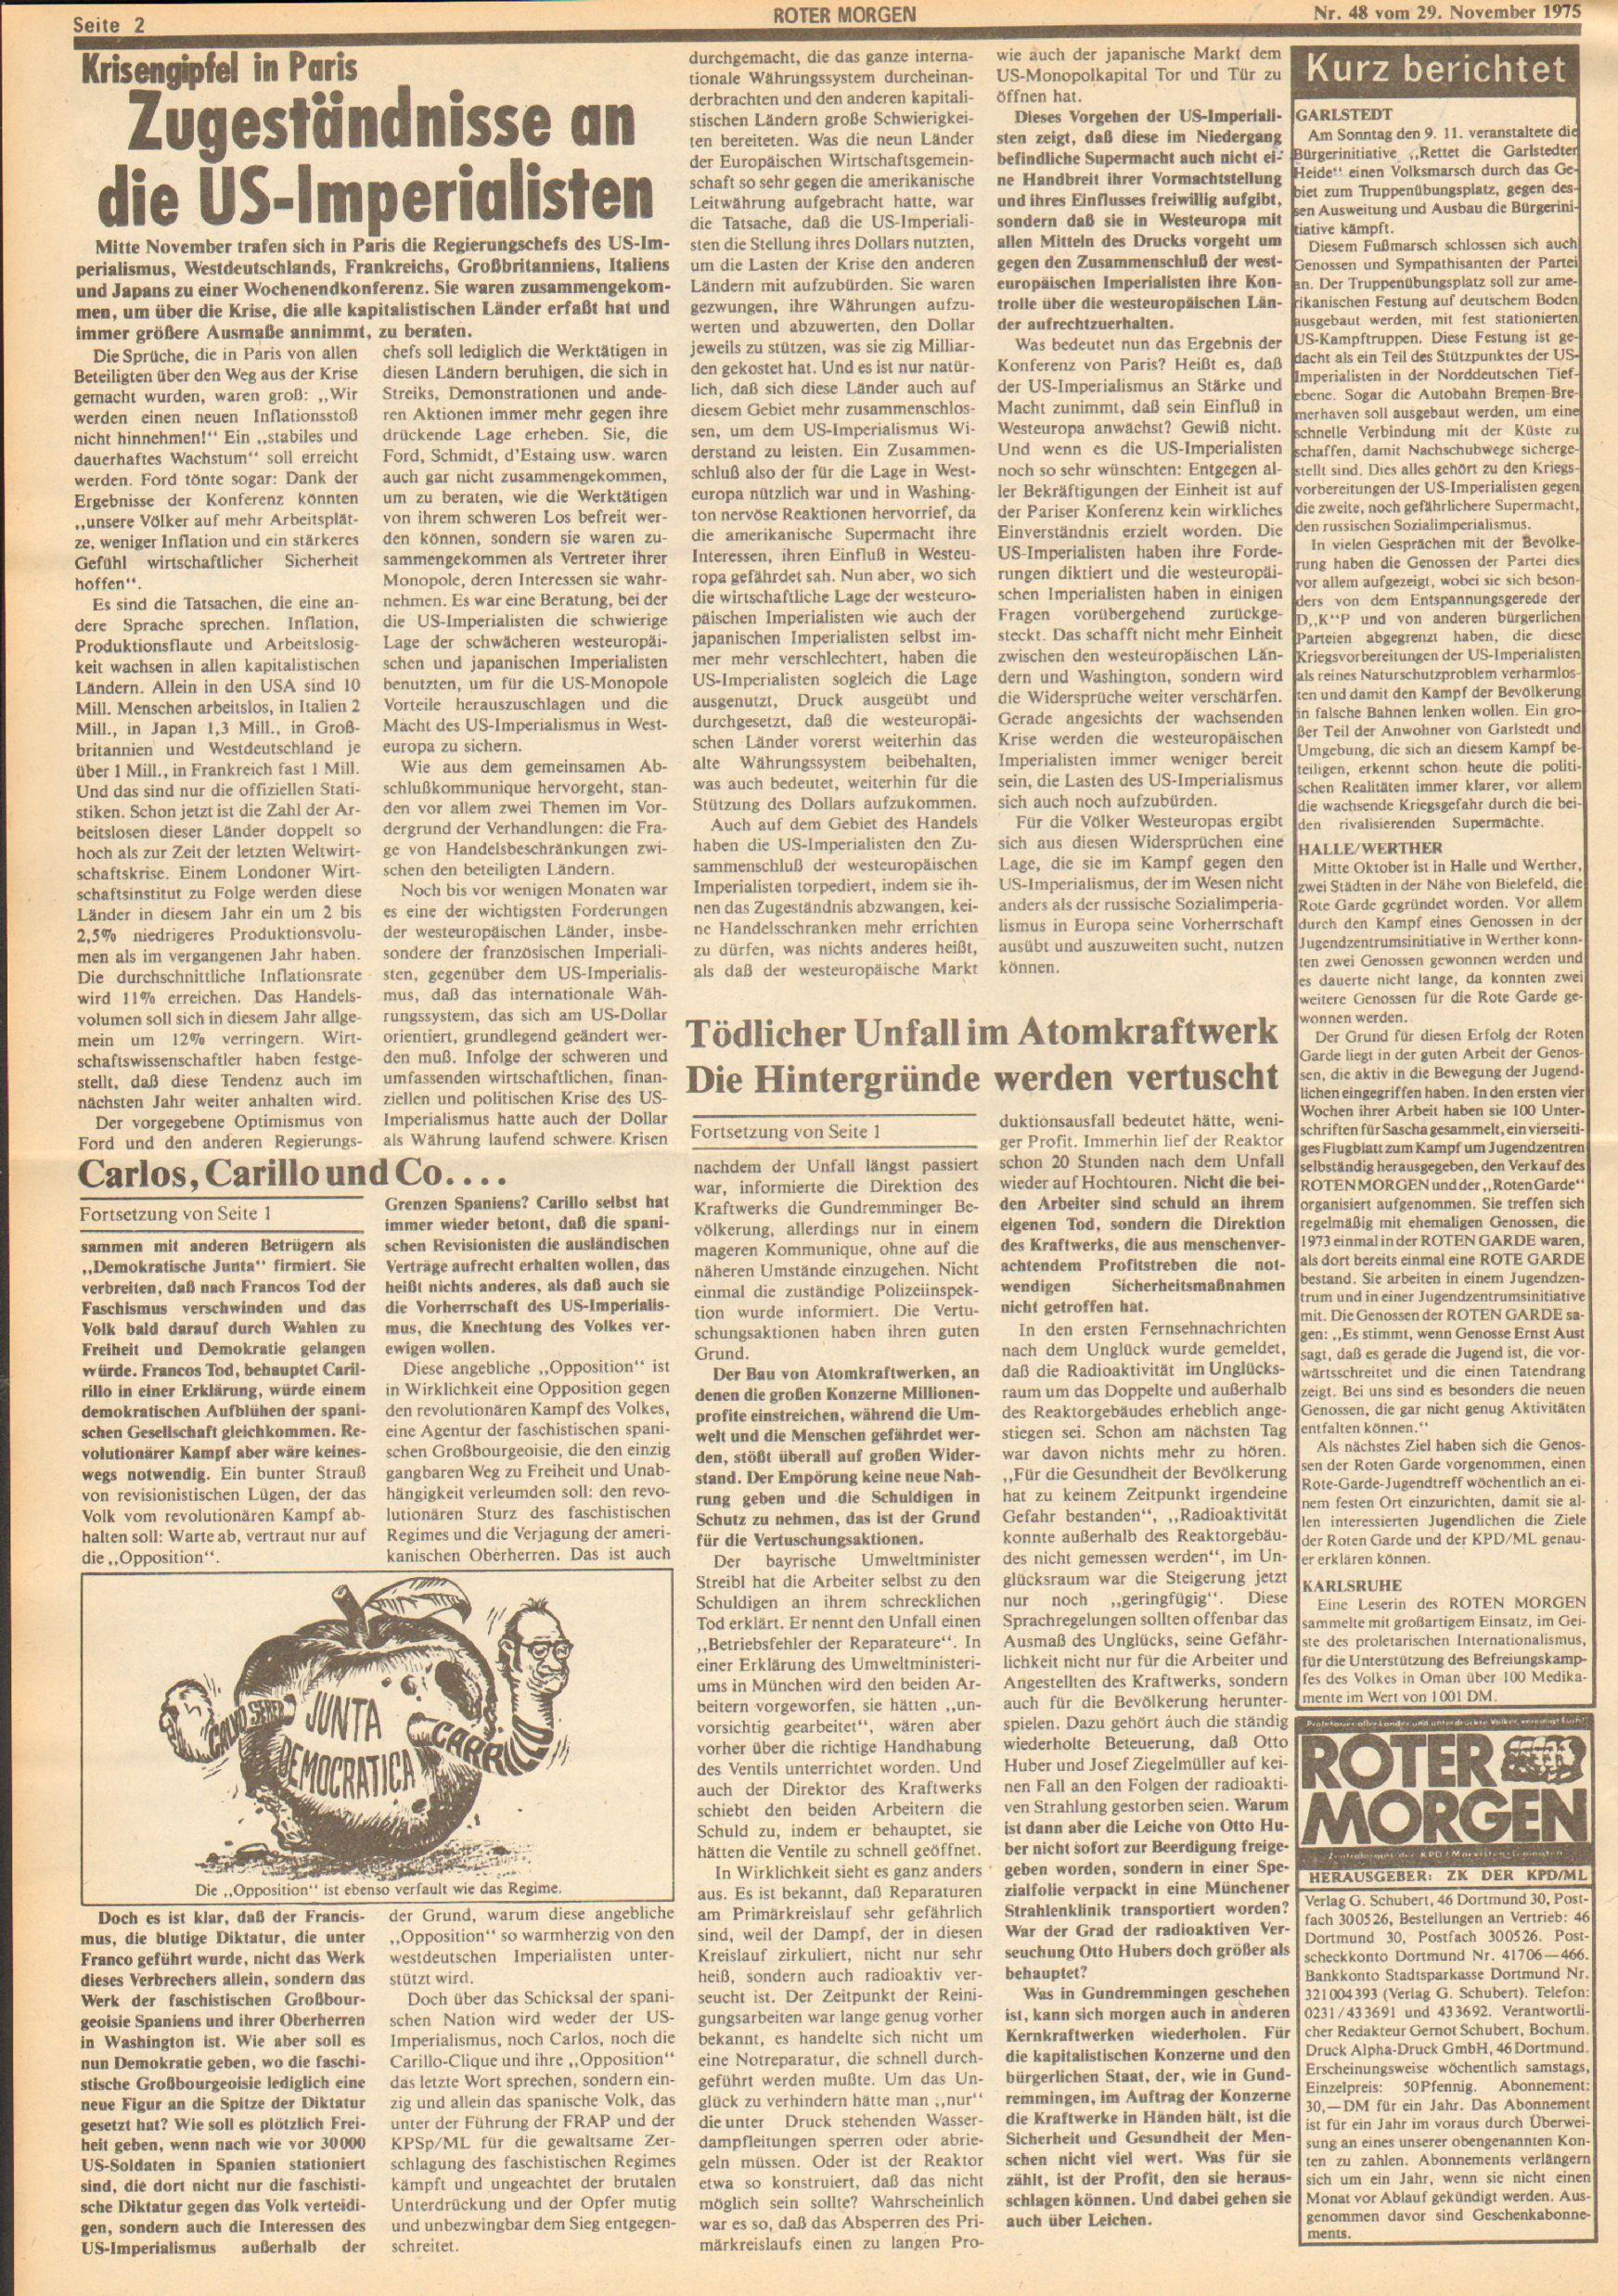 Roter Morgen, 9. Jg., 29. November 1975, Nr. 48, Seite 2